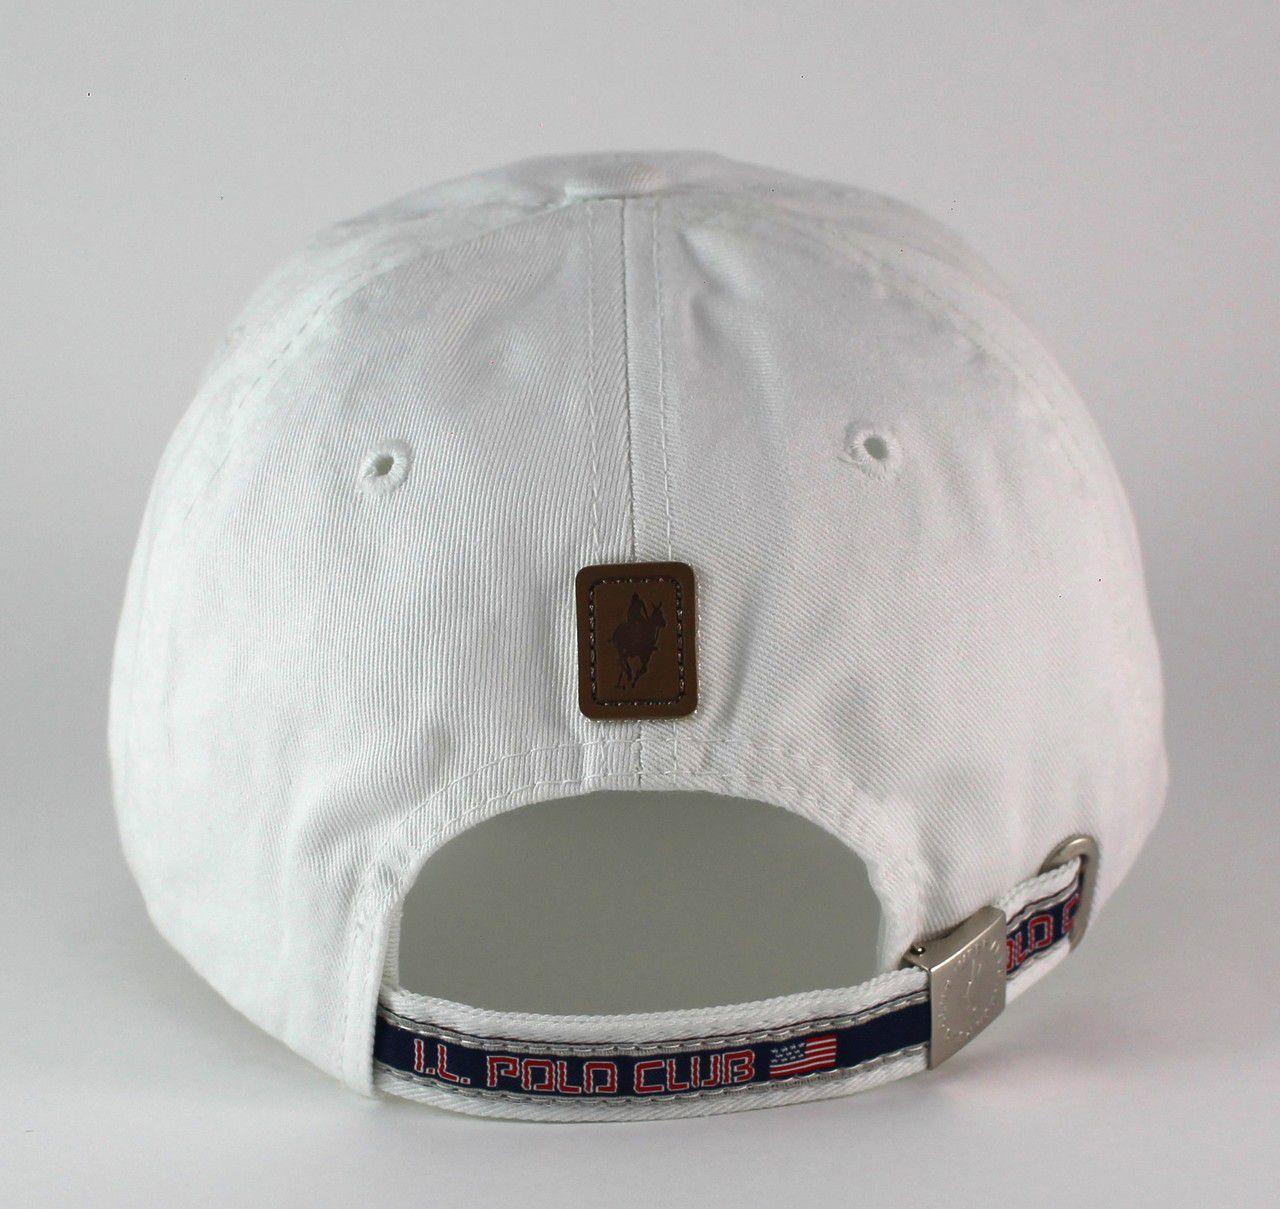 Boné Polo Imperial London Branco Aba Curva Strapback de Fita Unisex Importado